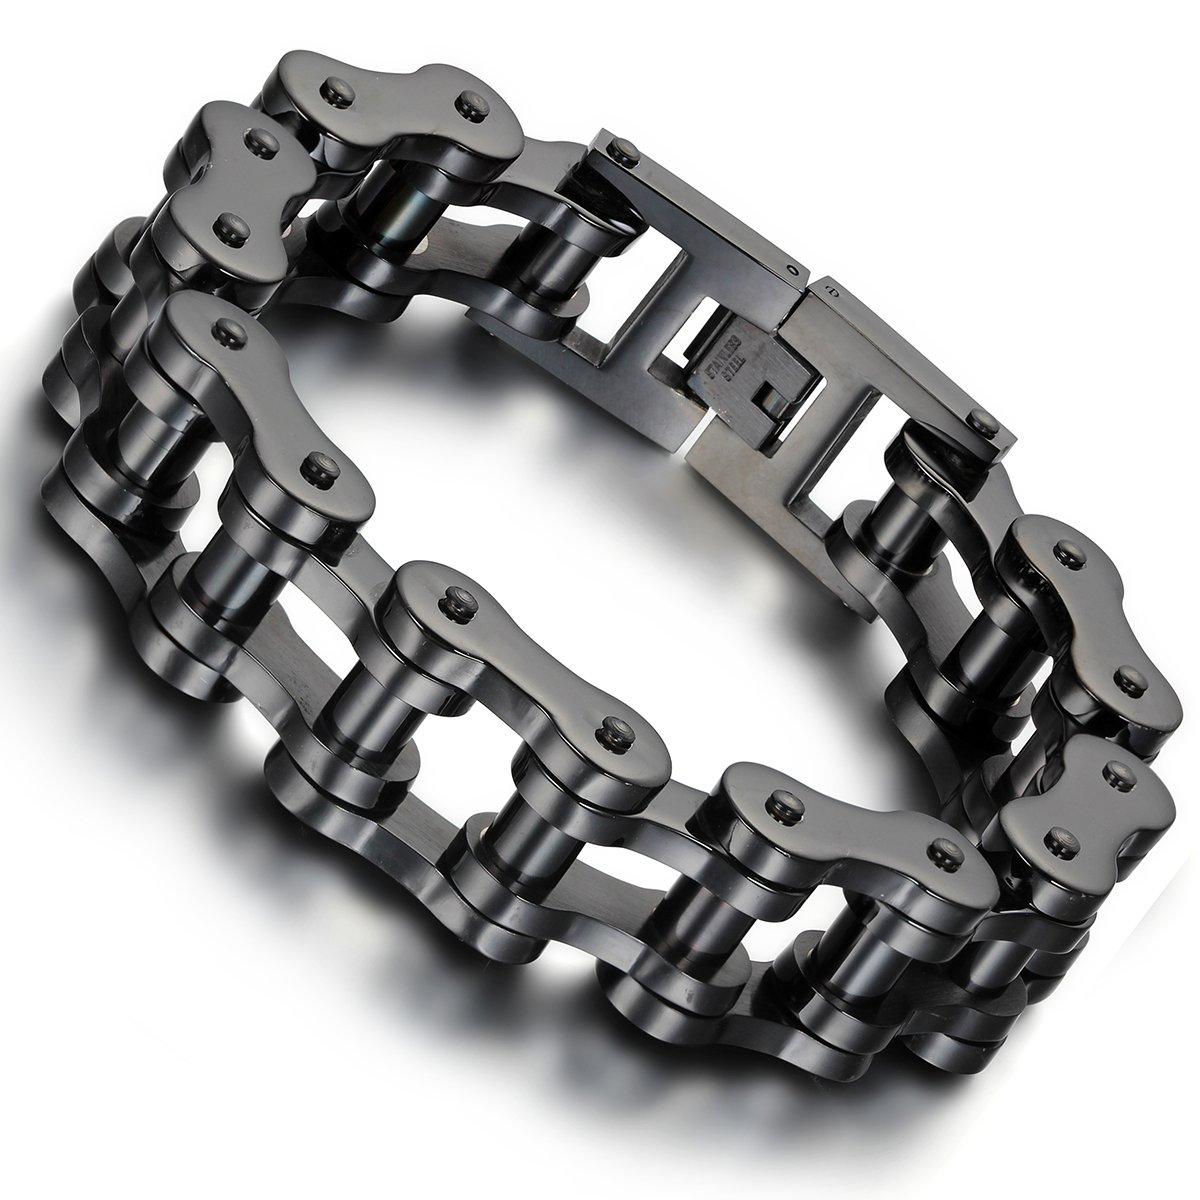 Flongo Men's Biker 18mm Wide Stainless Steel Heavy Motorcycle Chain Bicycle Link Bracelet, 9.13 inch FLG01045